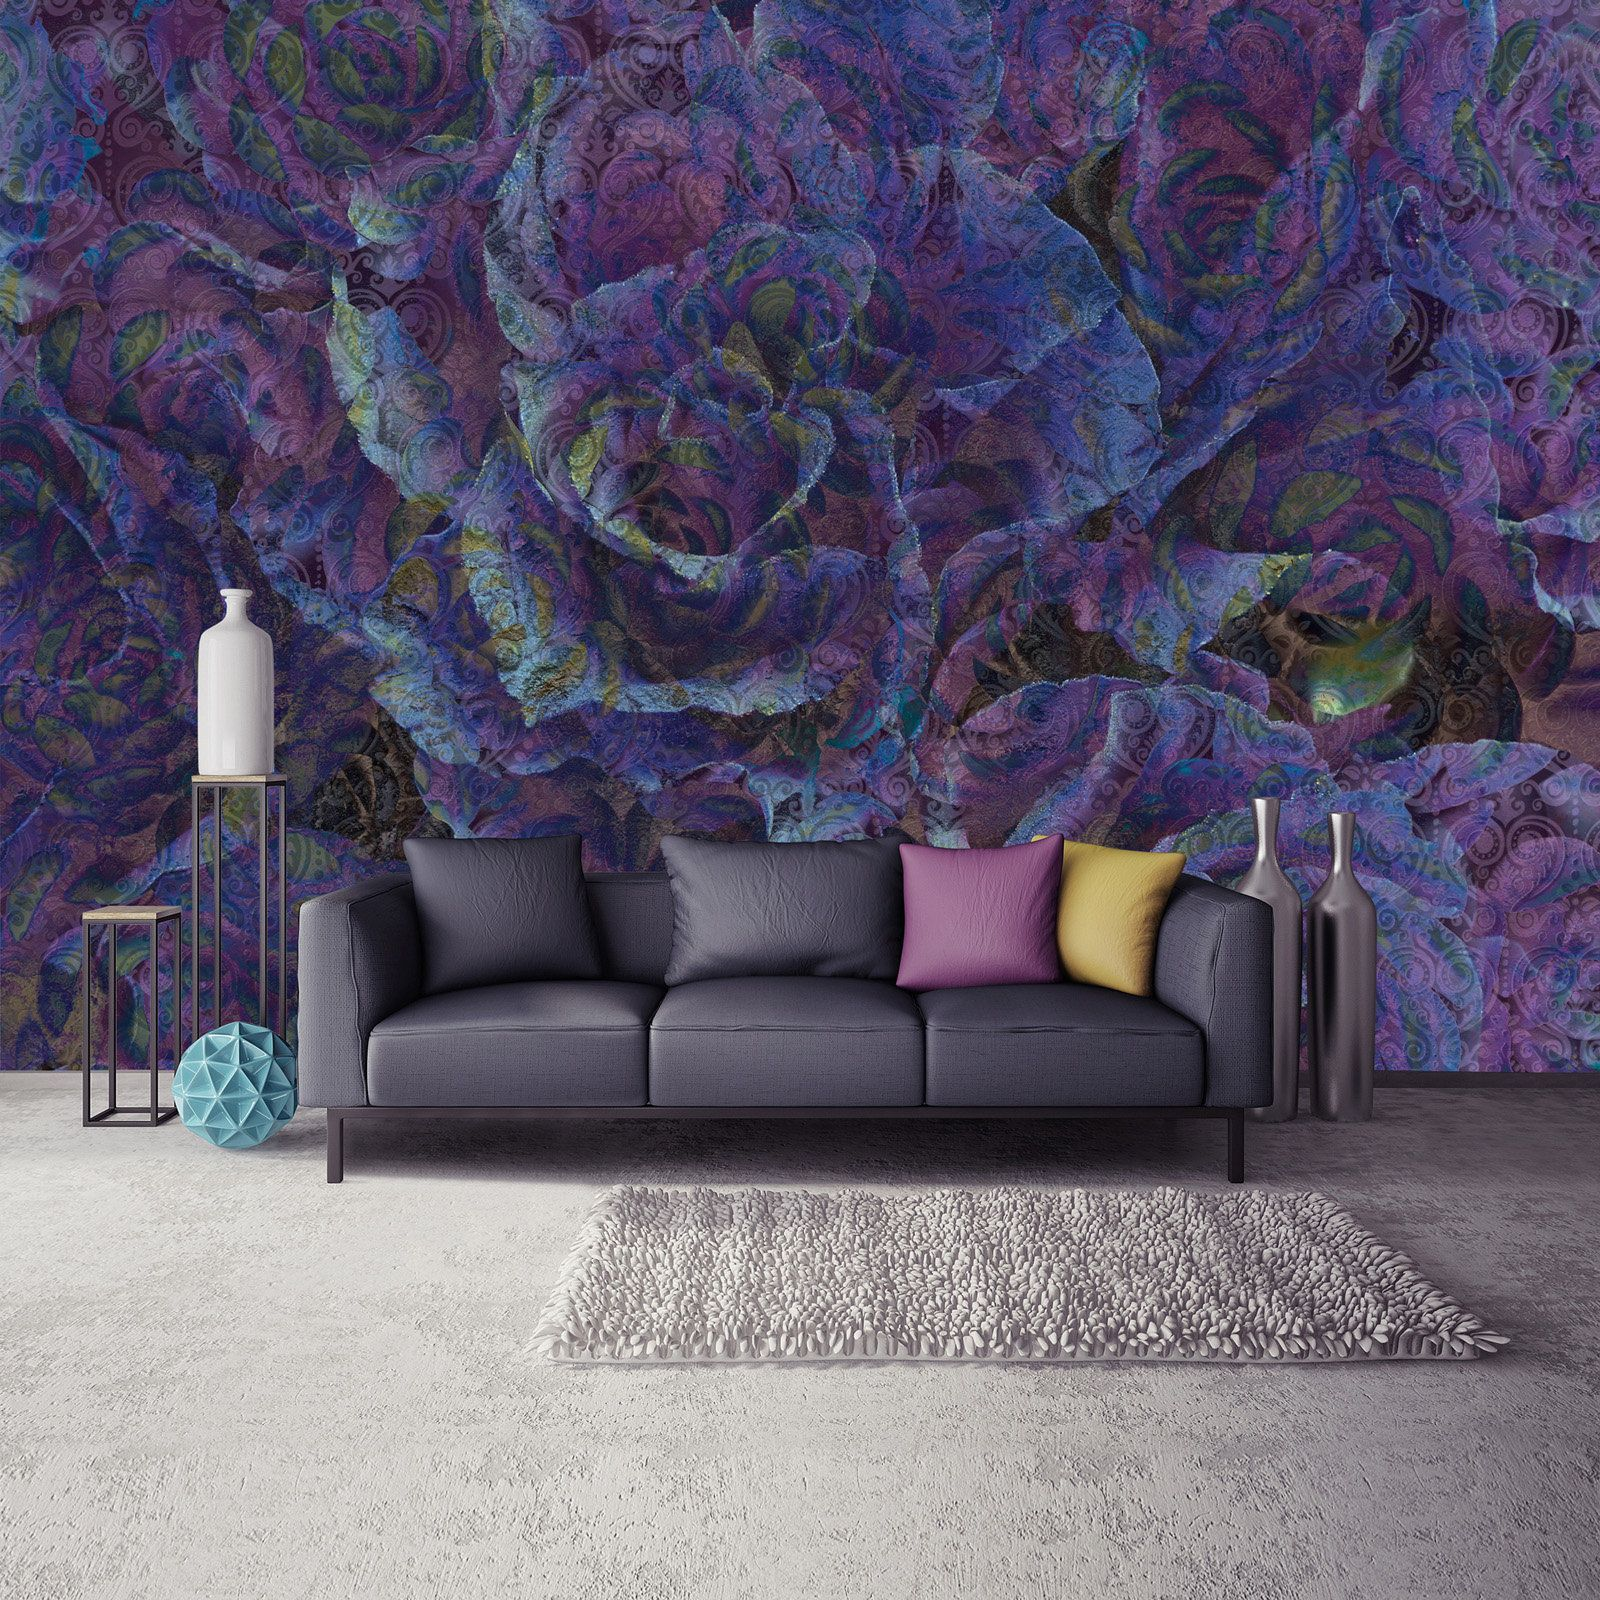 Purple ROSE Wallpaper Photo Mural Wall Decoration